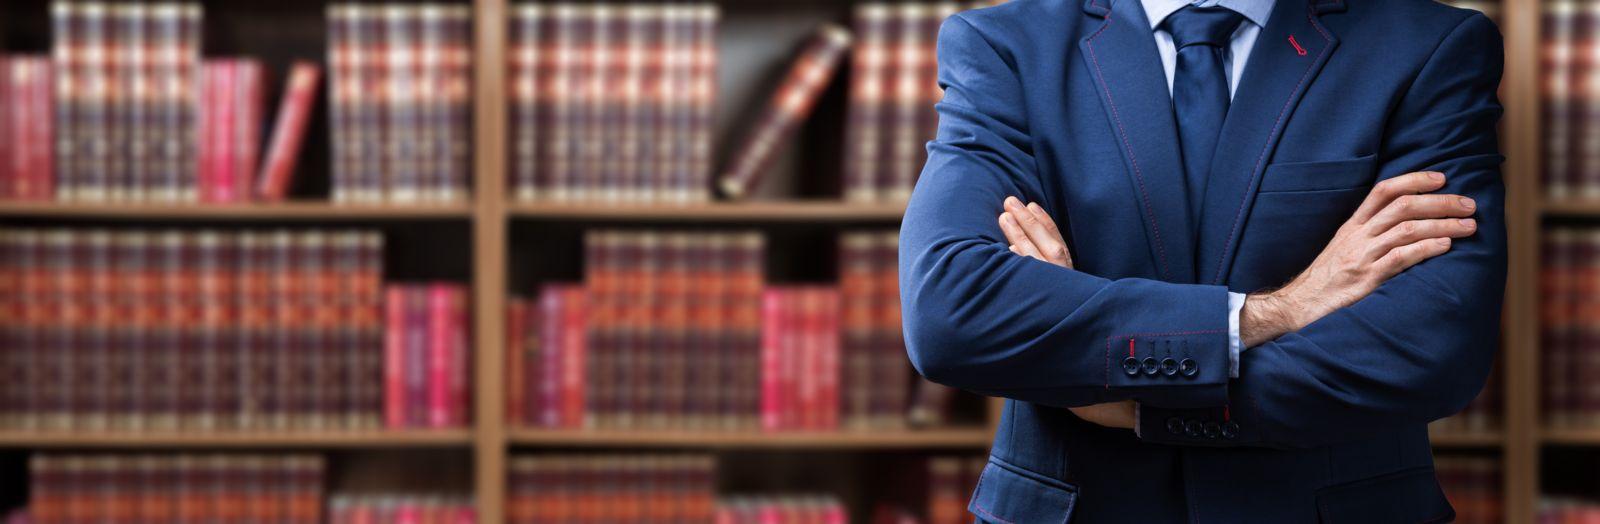 Michigan business law attorneys